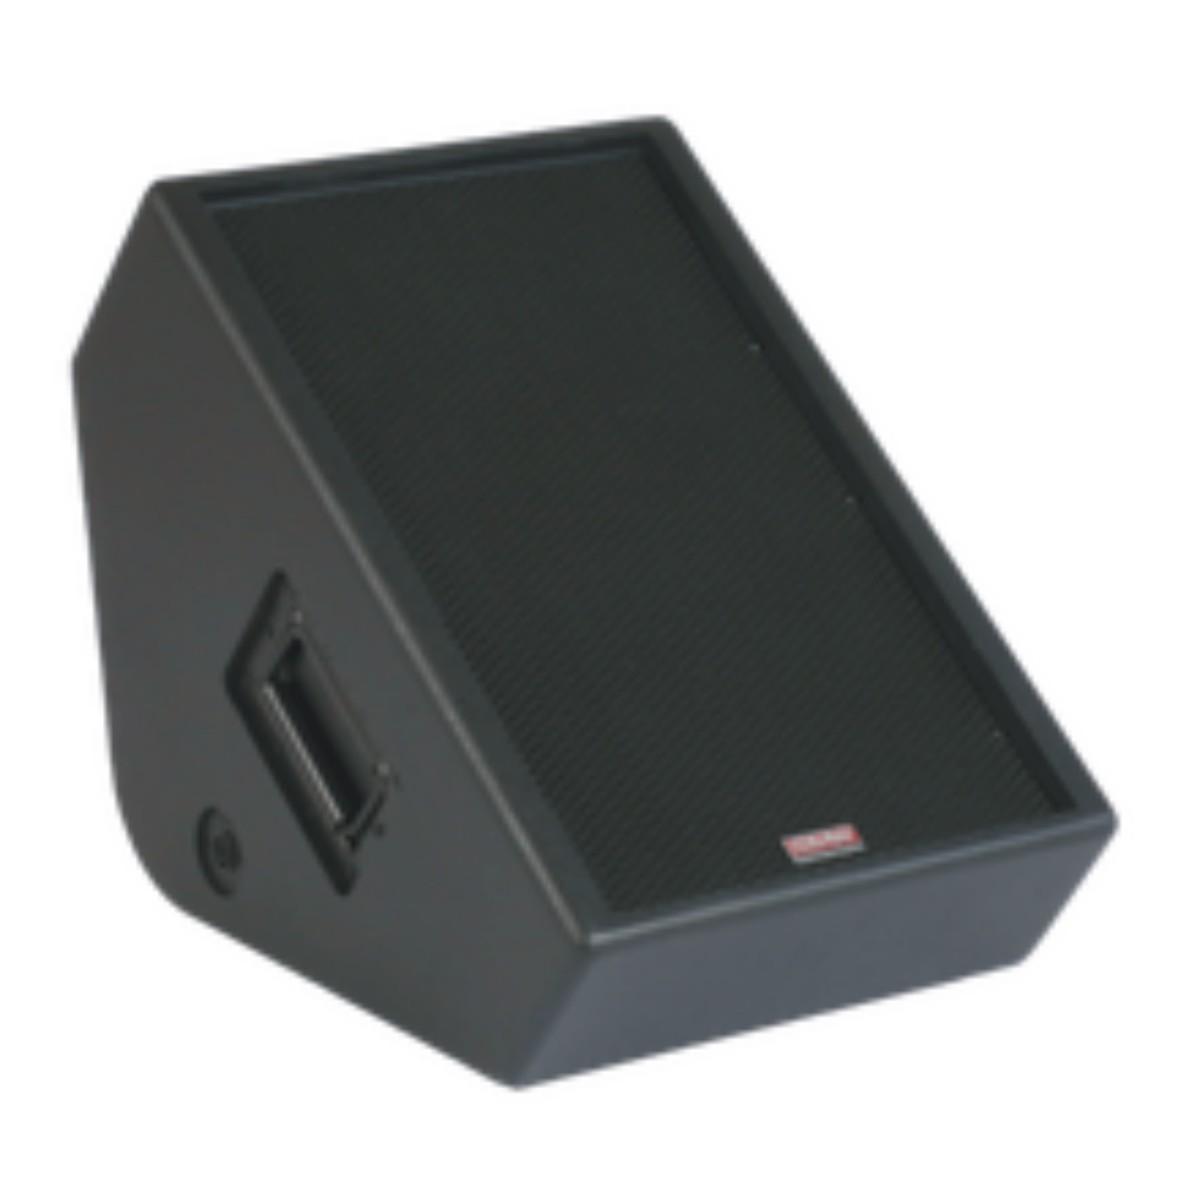 VFM129 2分频舞台监听音箱